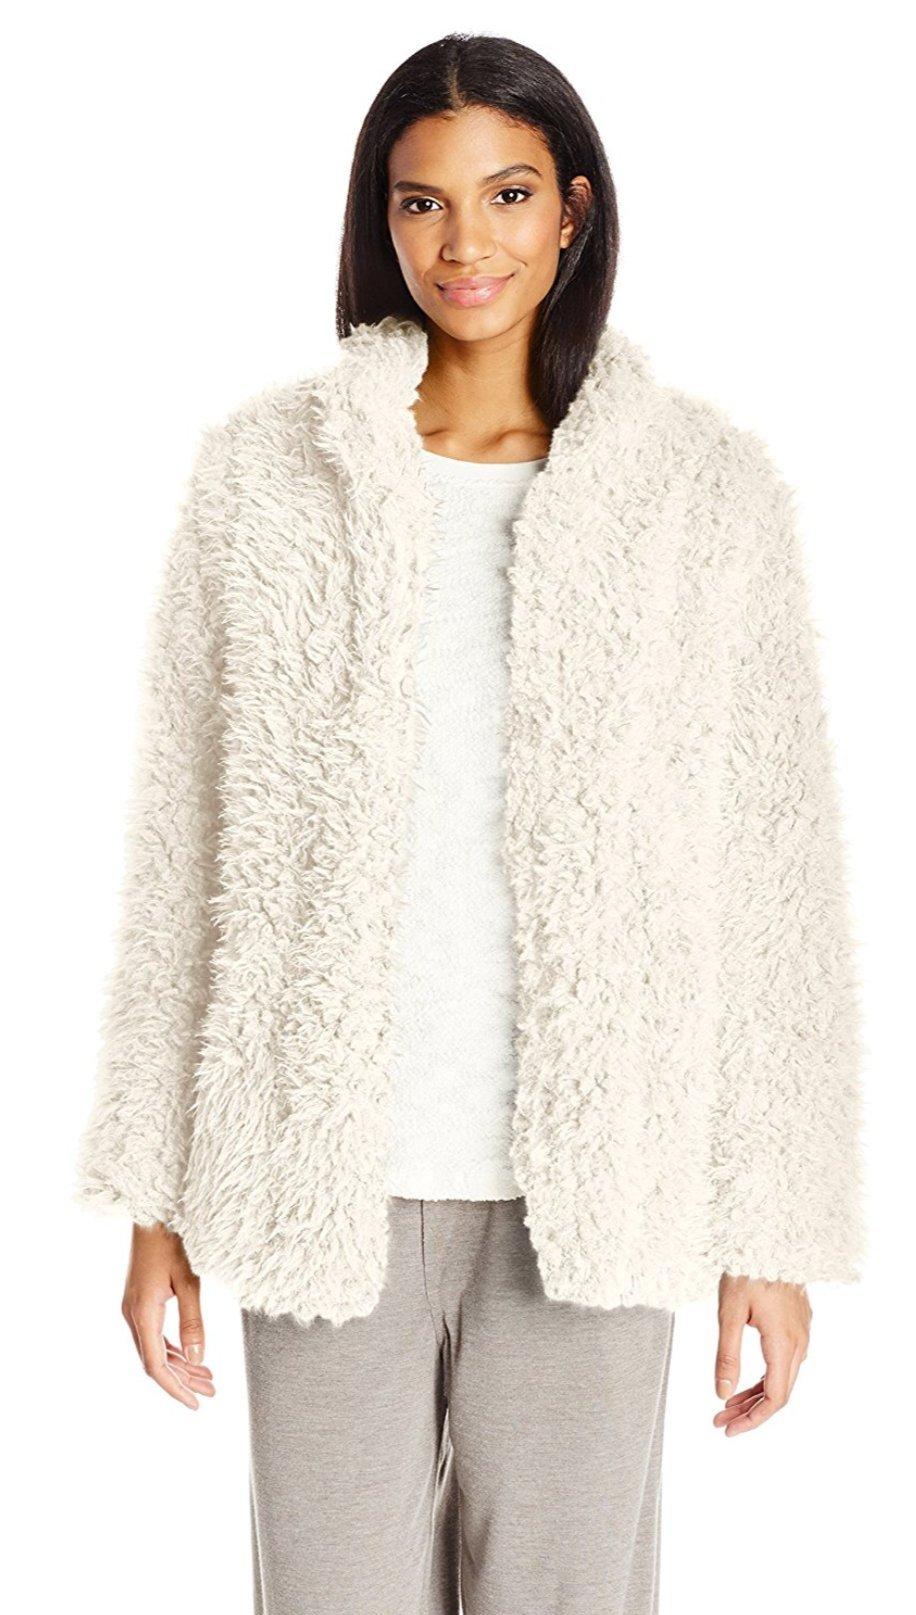 PJ Salvage Women's Shag Jacket, Natural, M